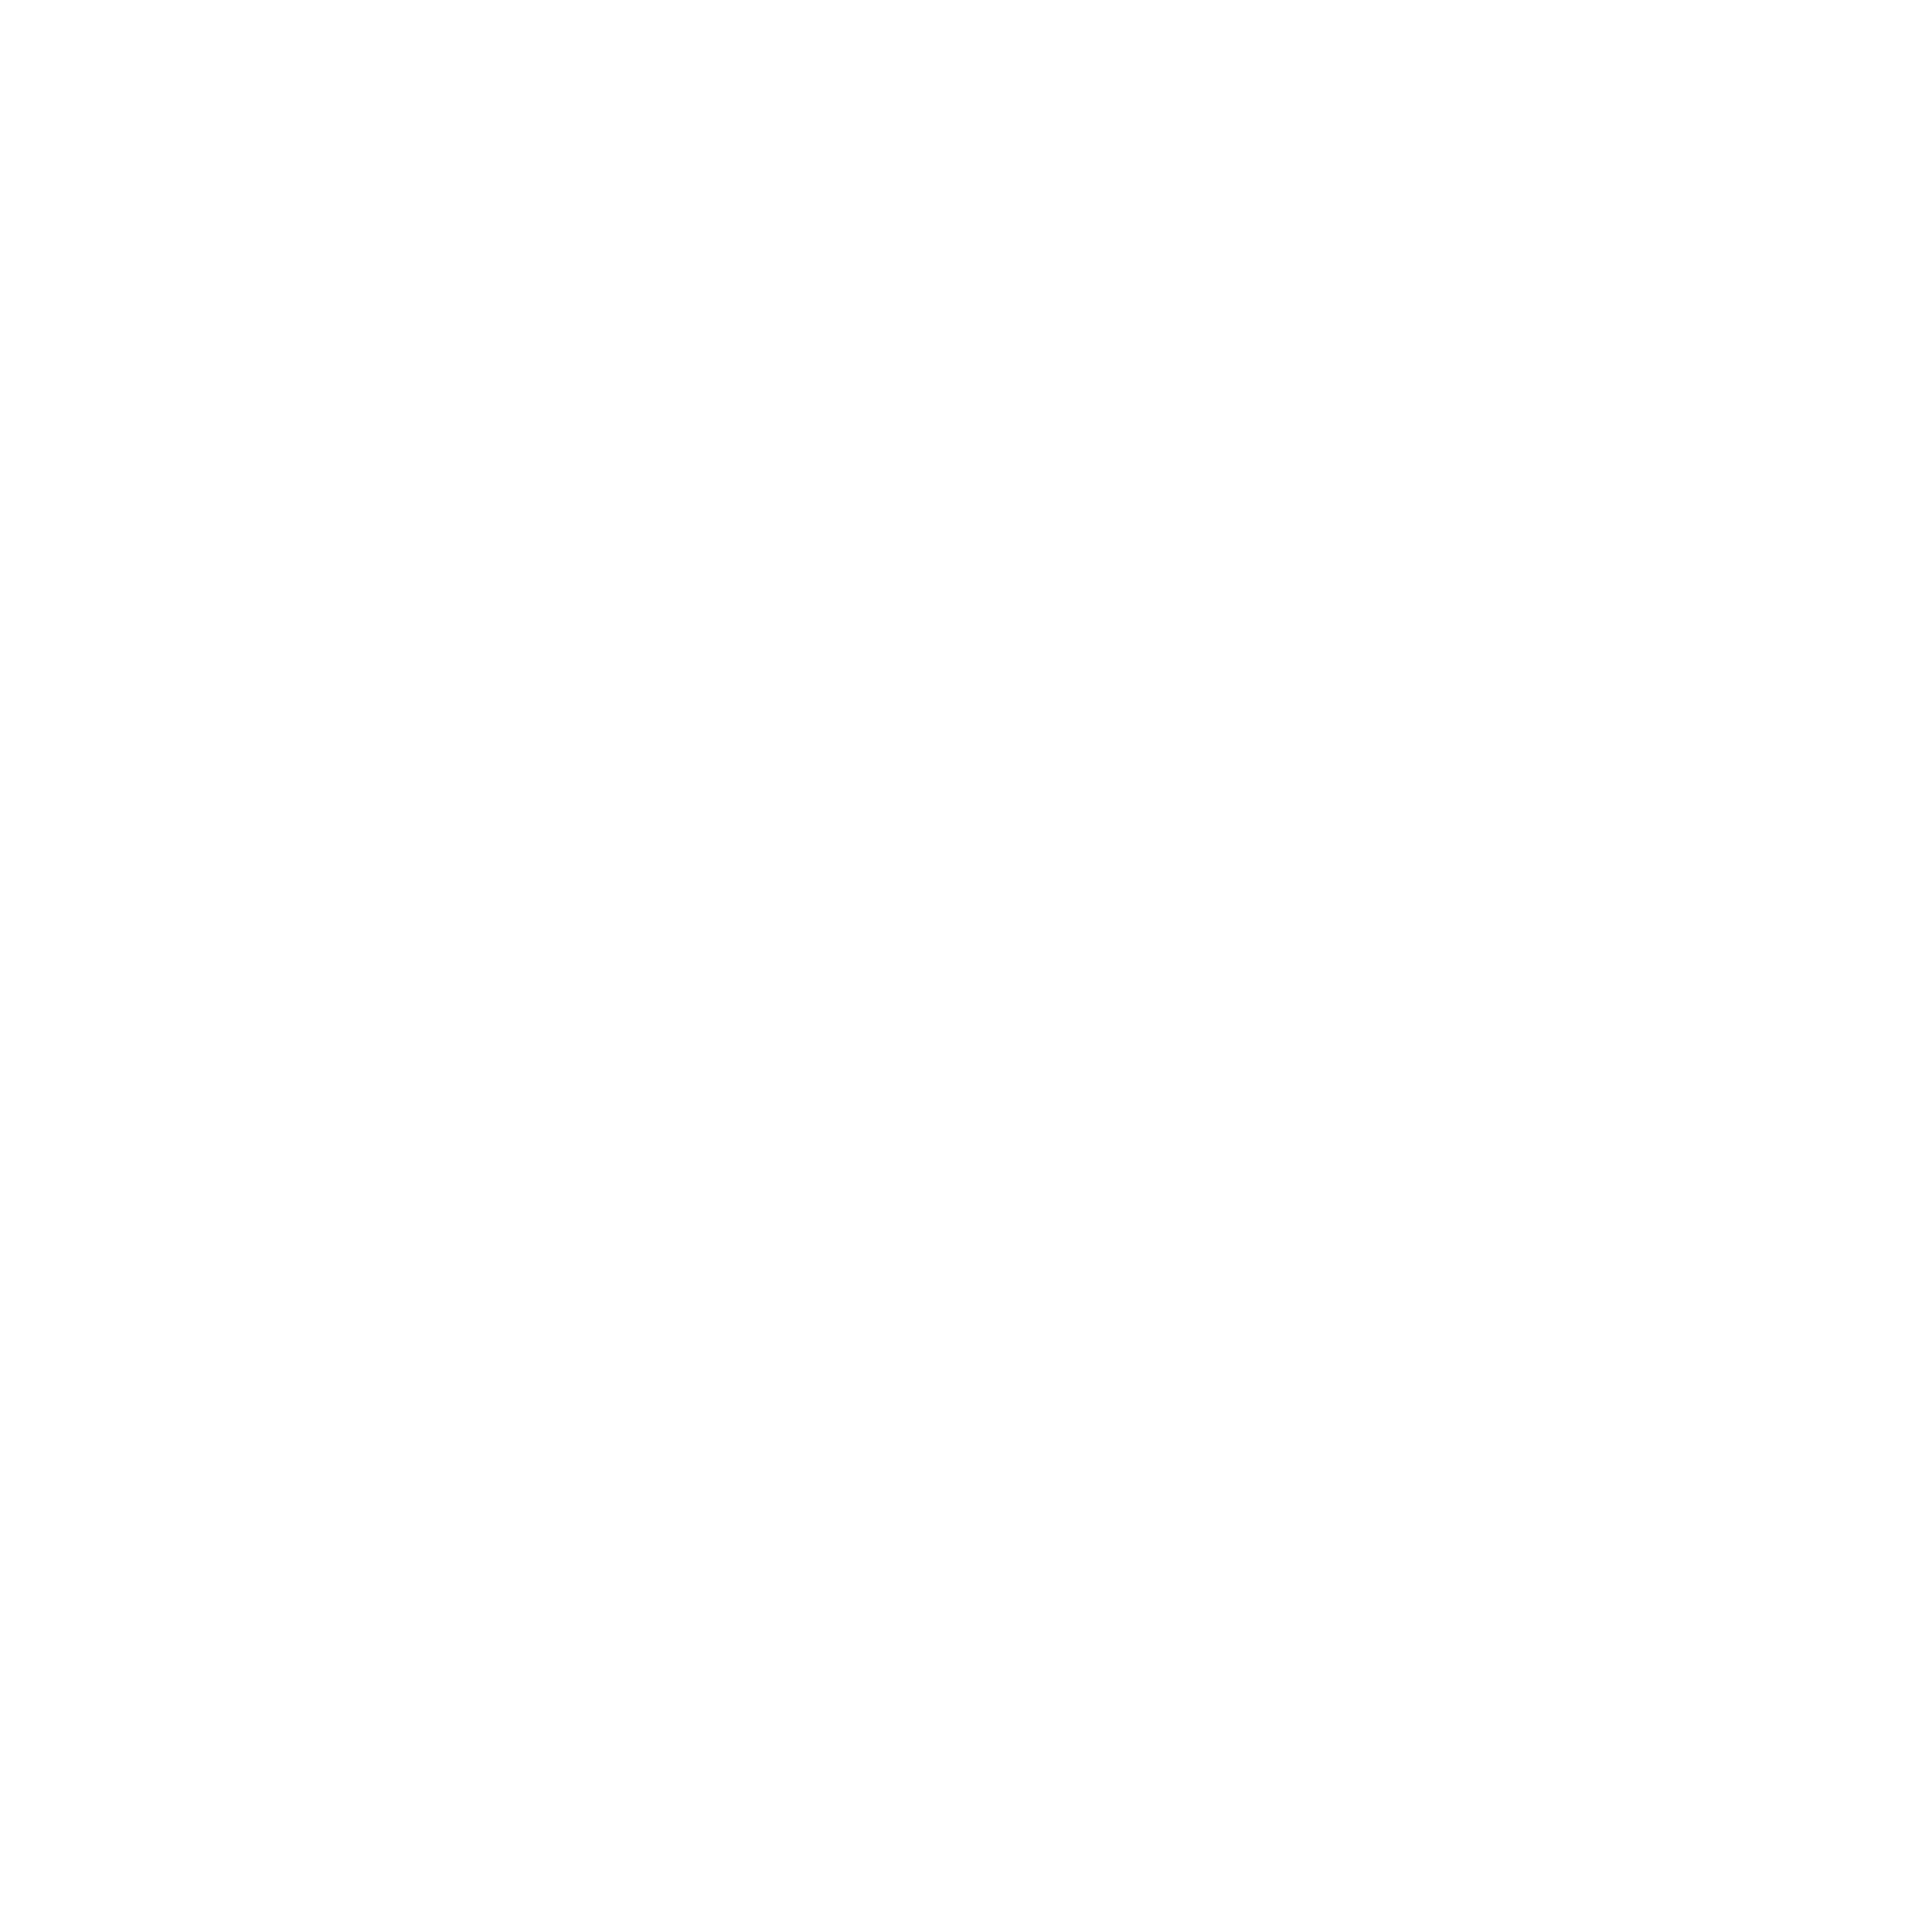 led lighting circuits